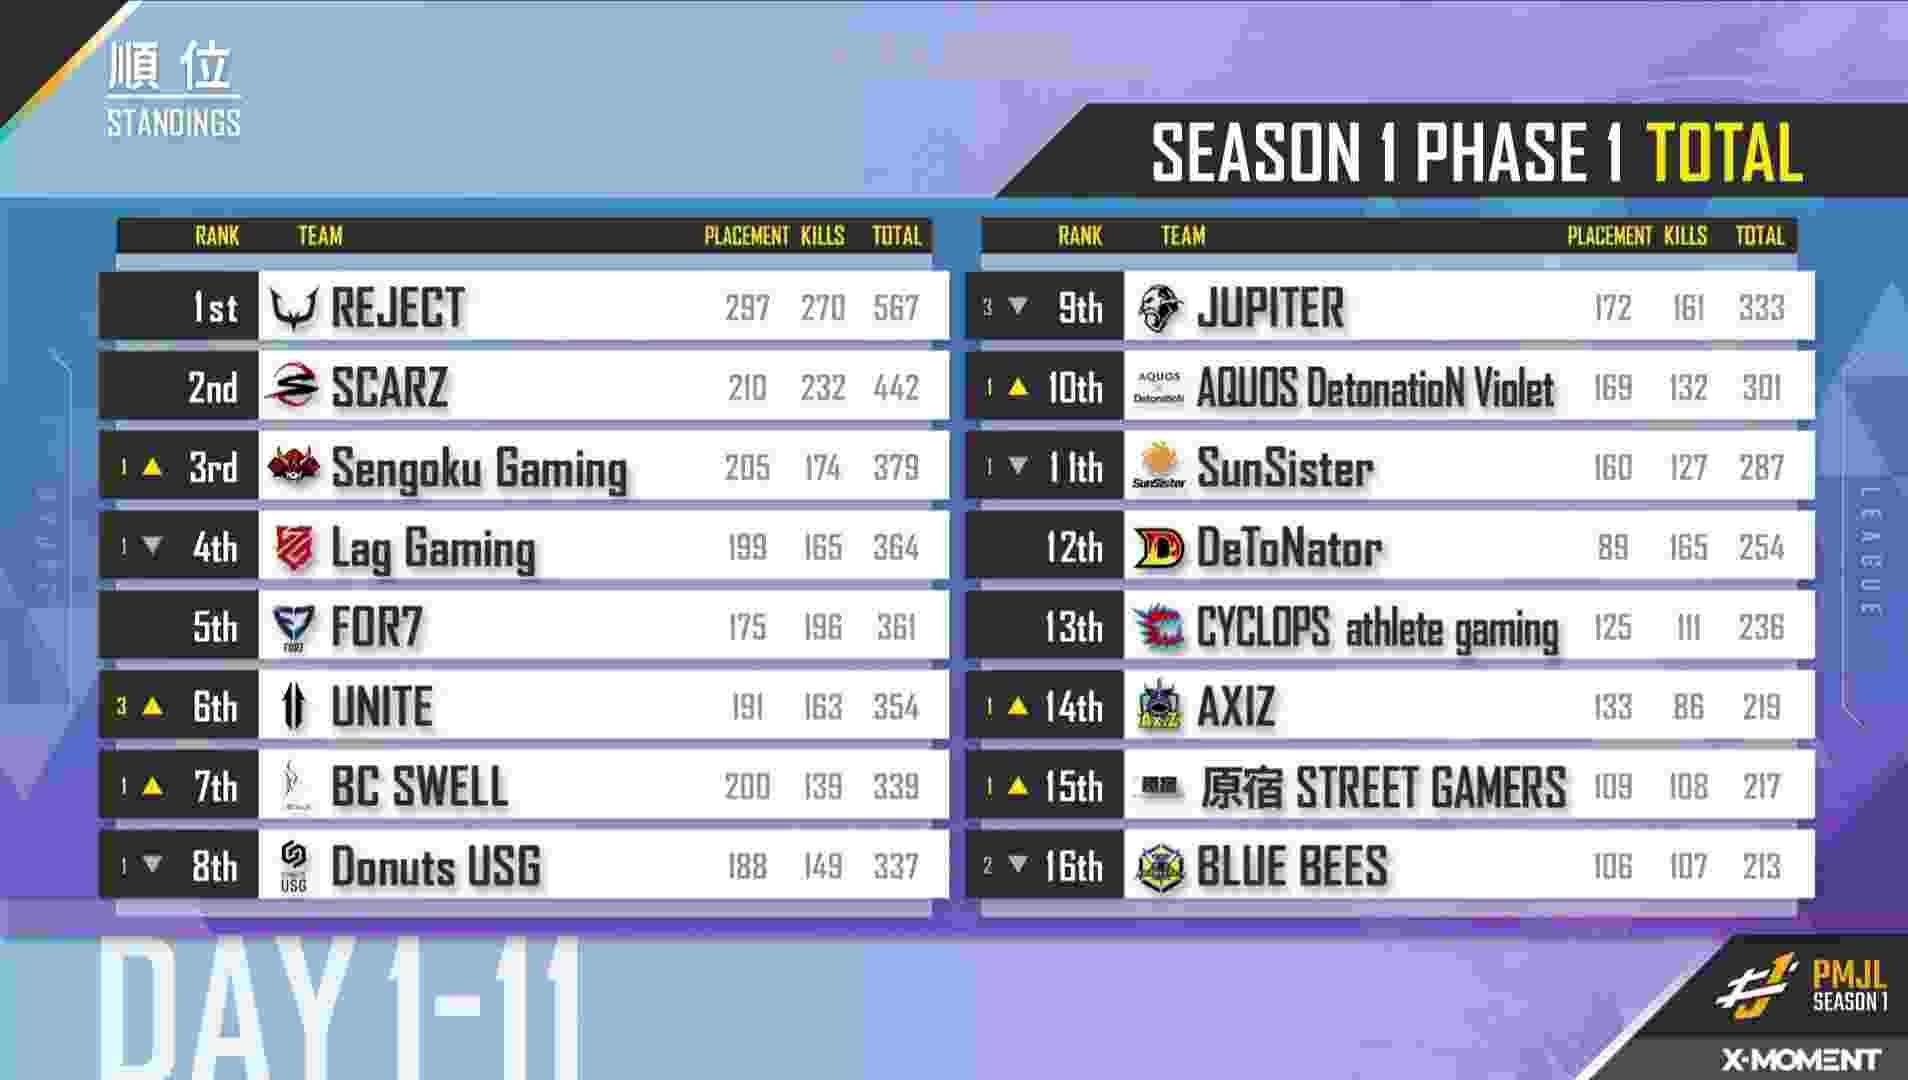 PMJL Season 1 Overall Standings